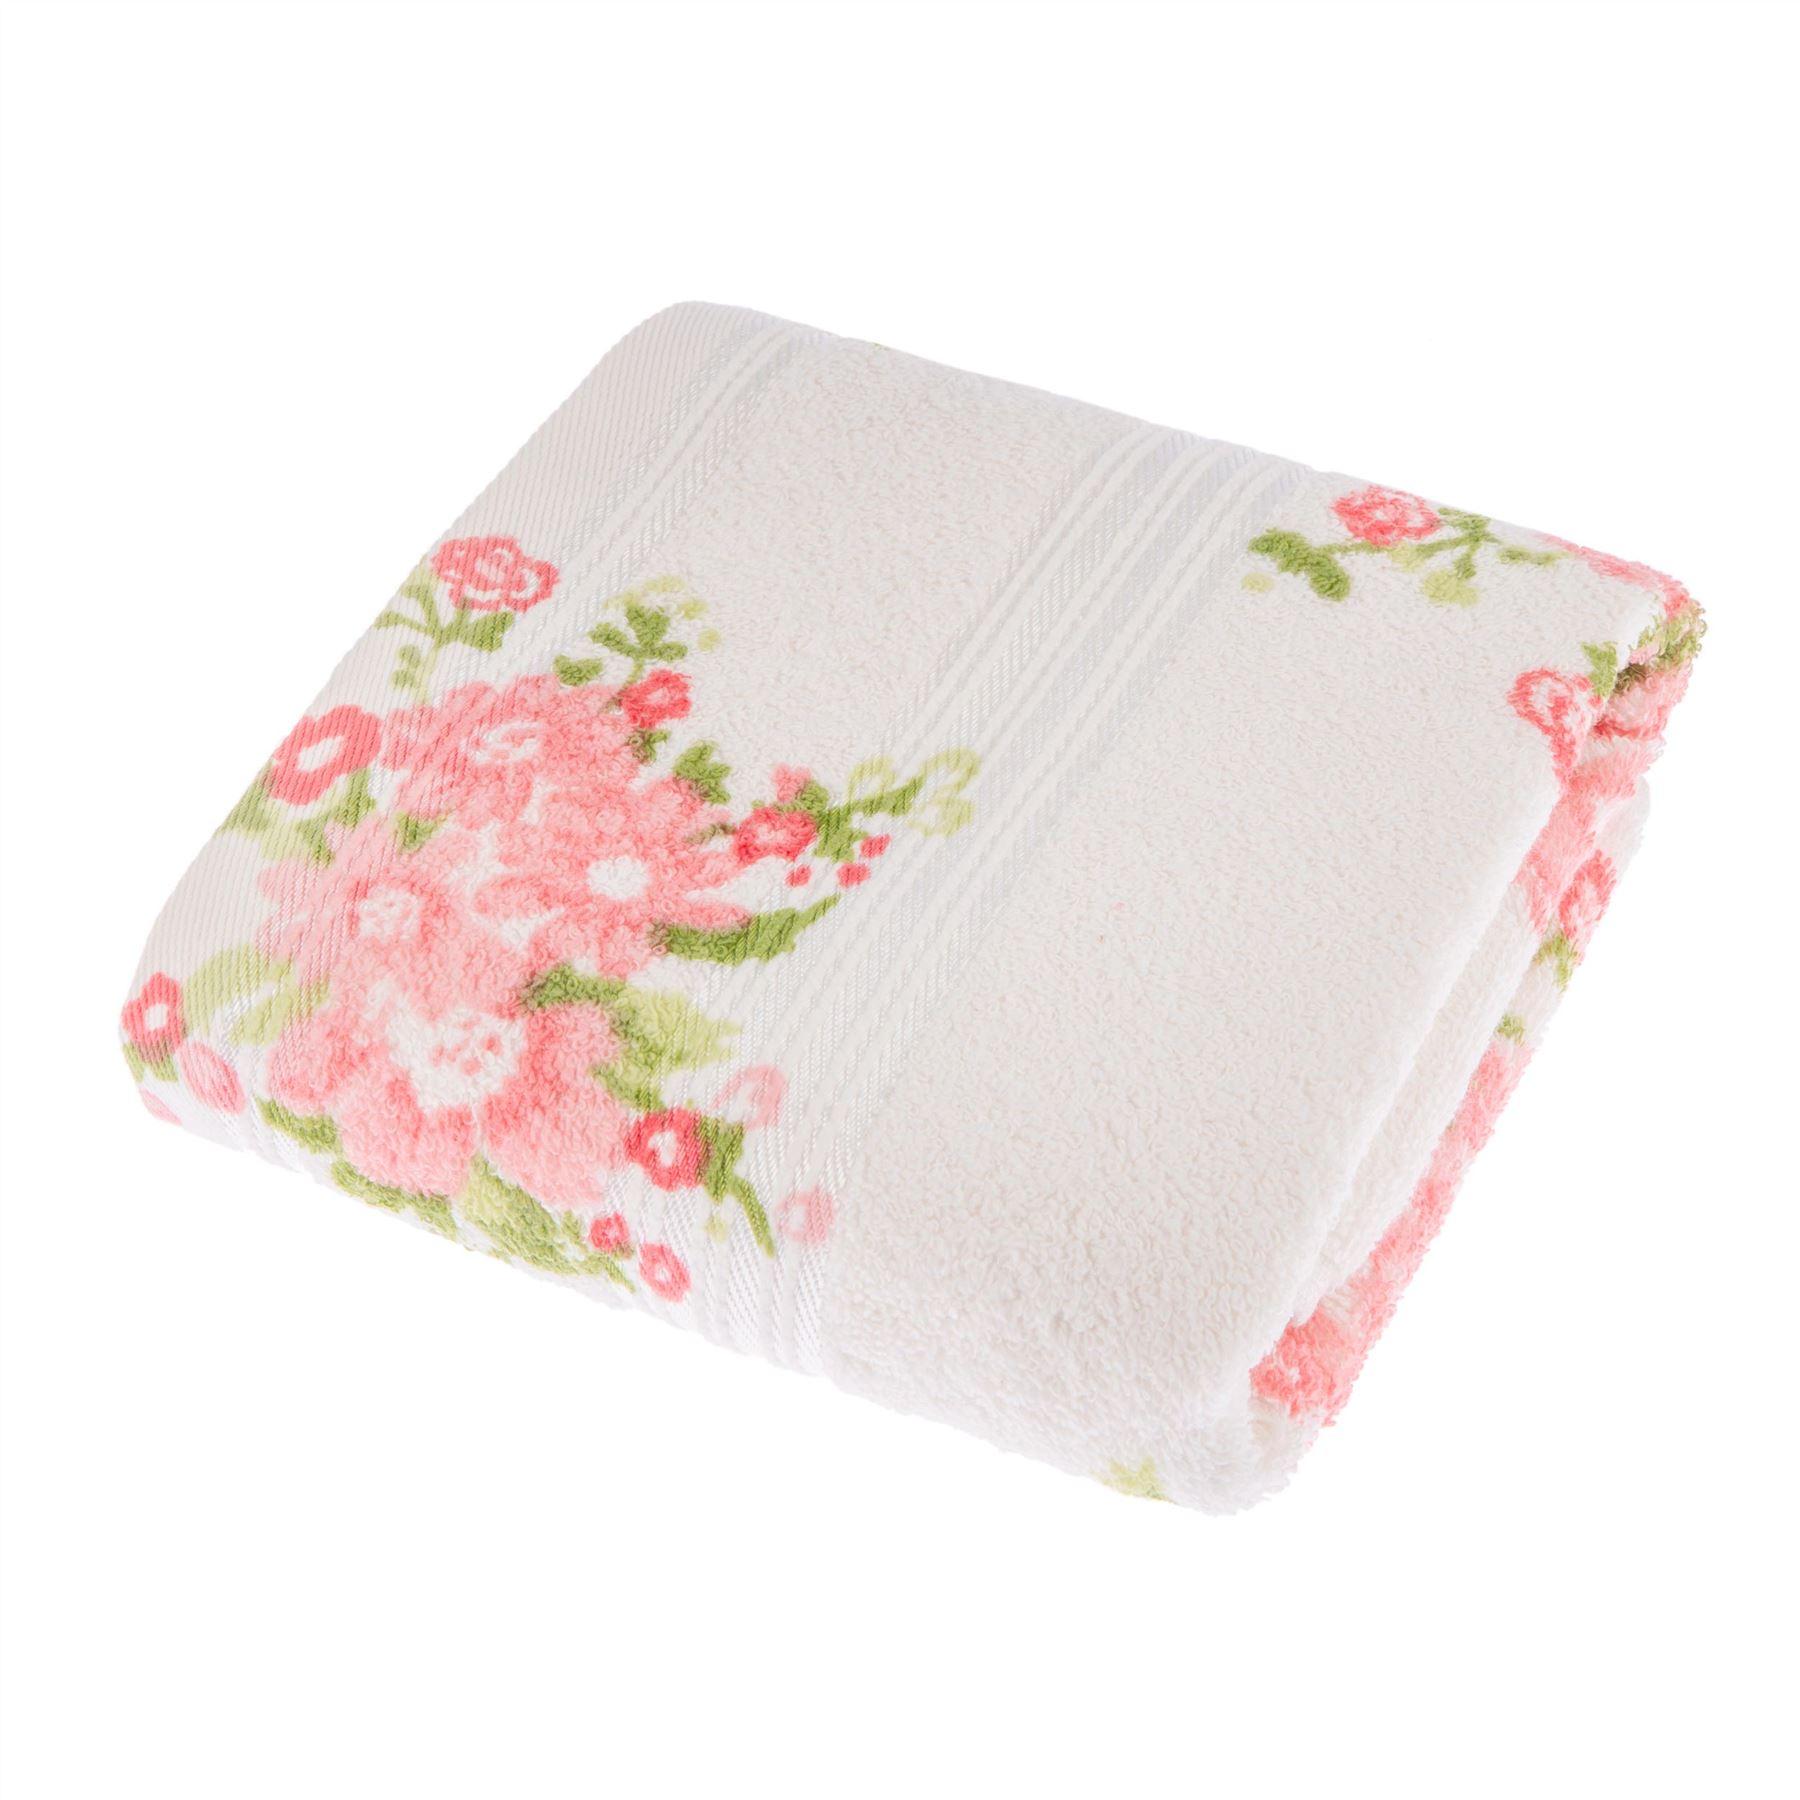 Rose Floral Printed 100 Cotton Face Hand Bath Towel Bath Sheet White Cream Ebay